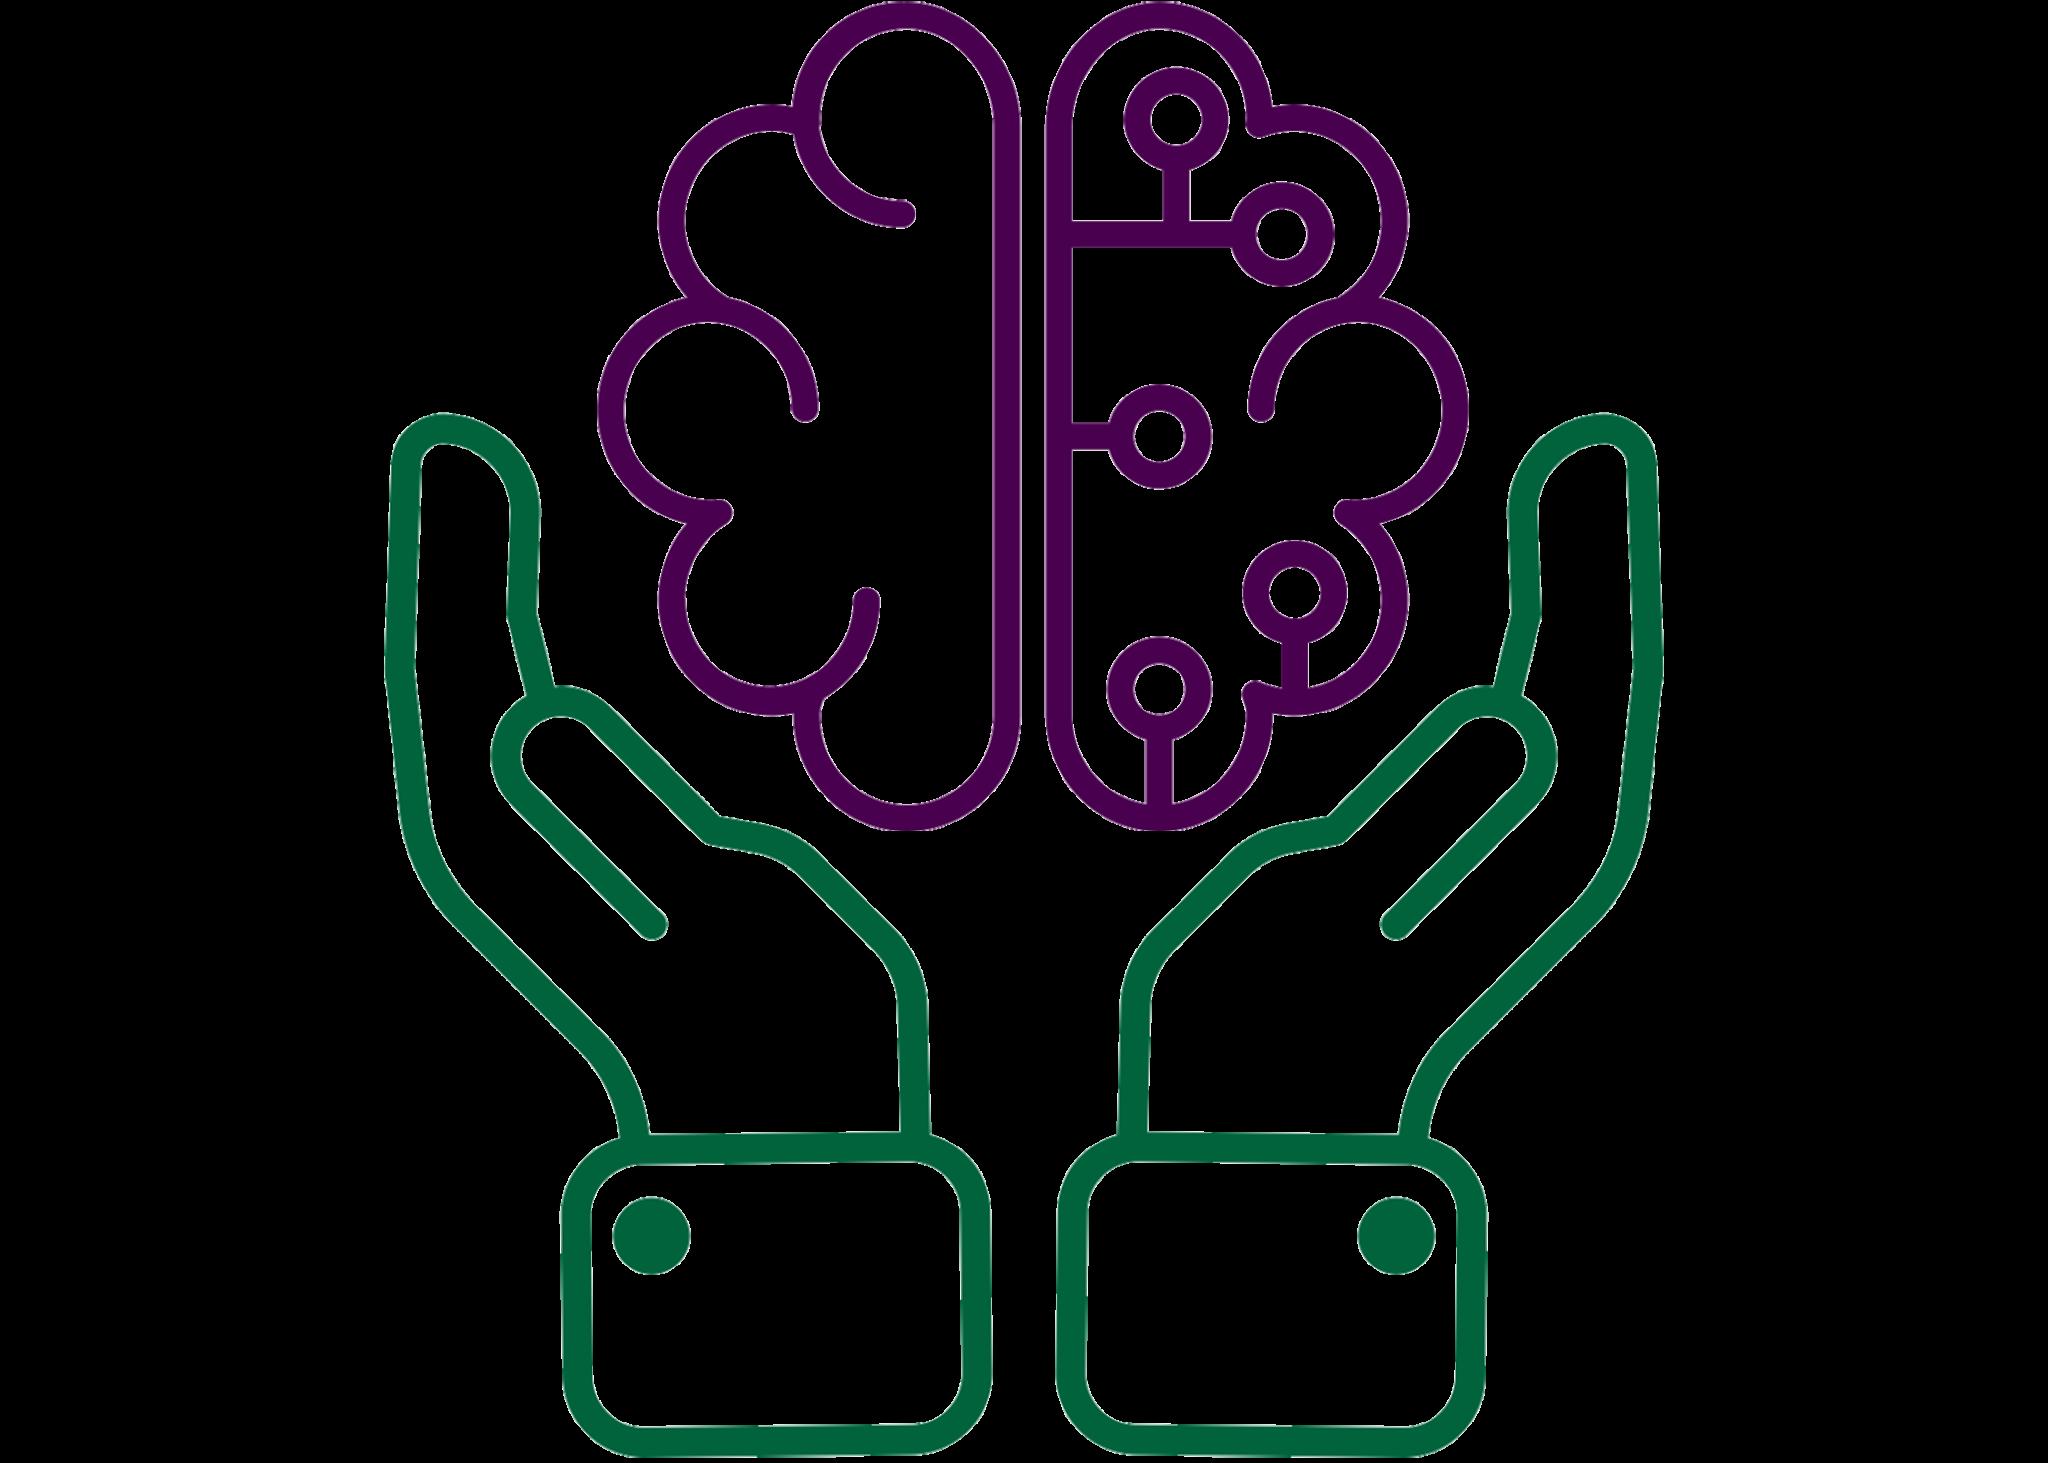 Hands holding a brain